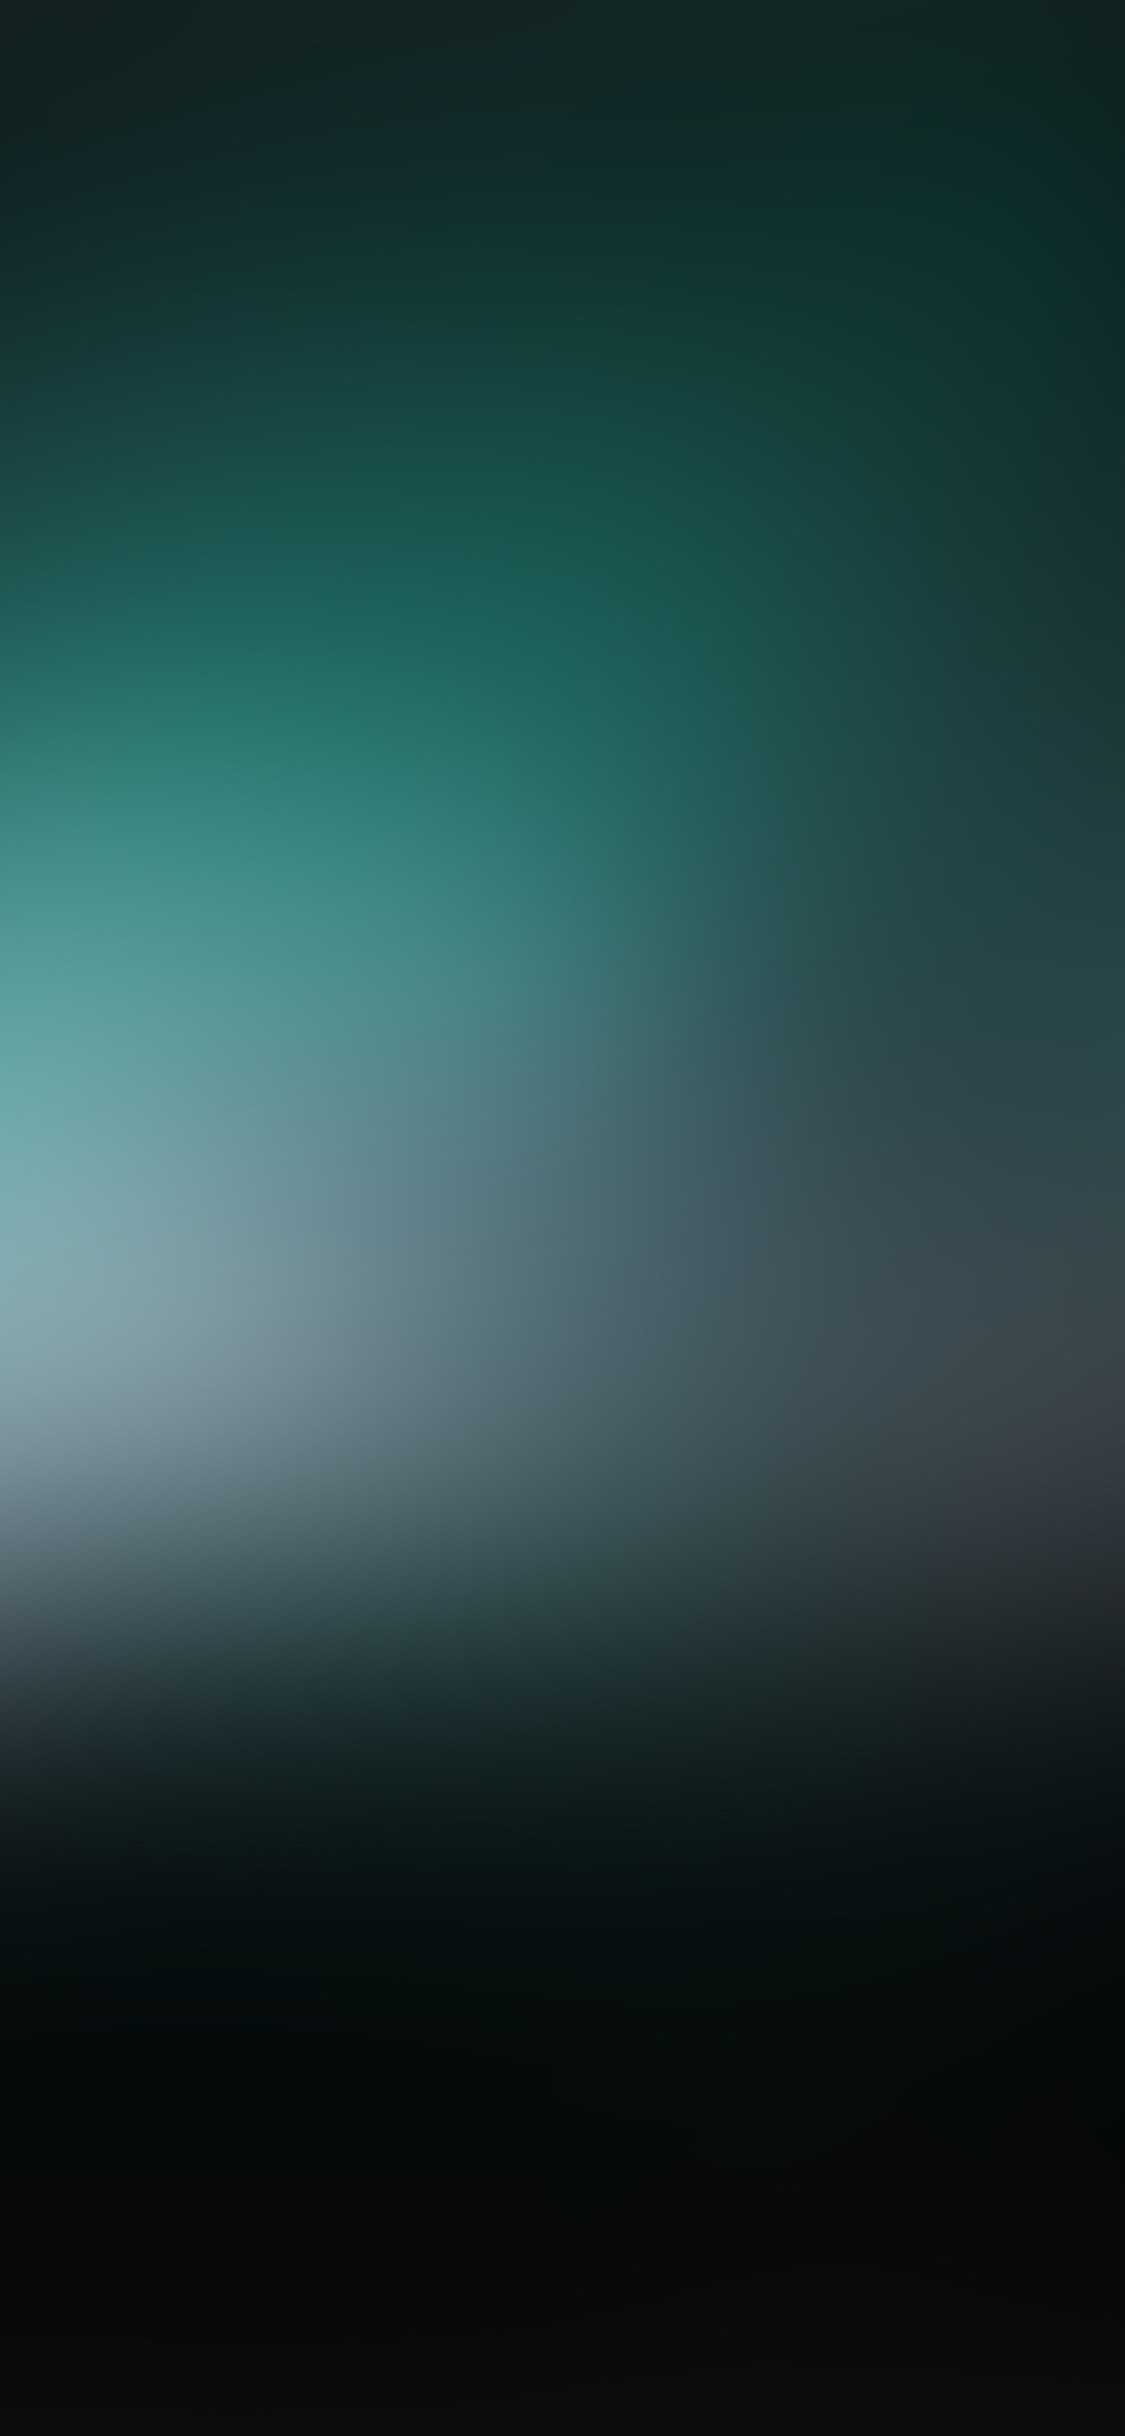 iPhoneXpapers.com-Apple-iPhone-wallpaper-sj13-green-dark-aurora-blur